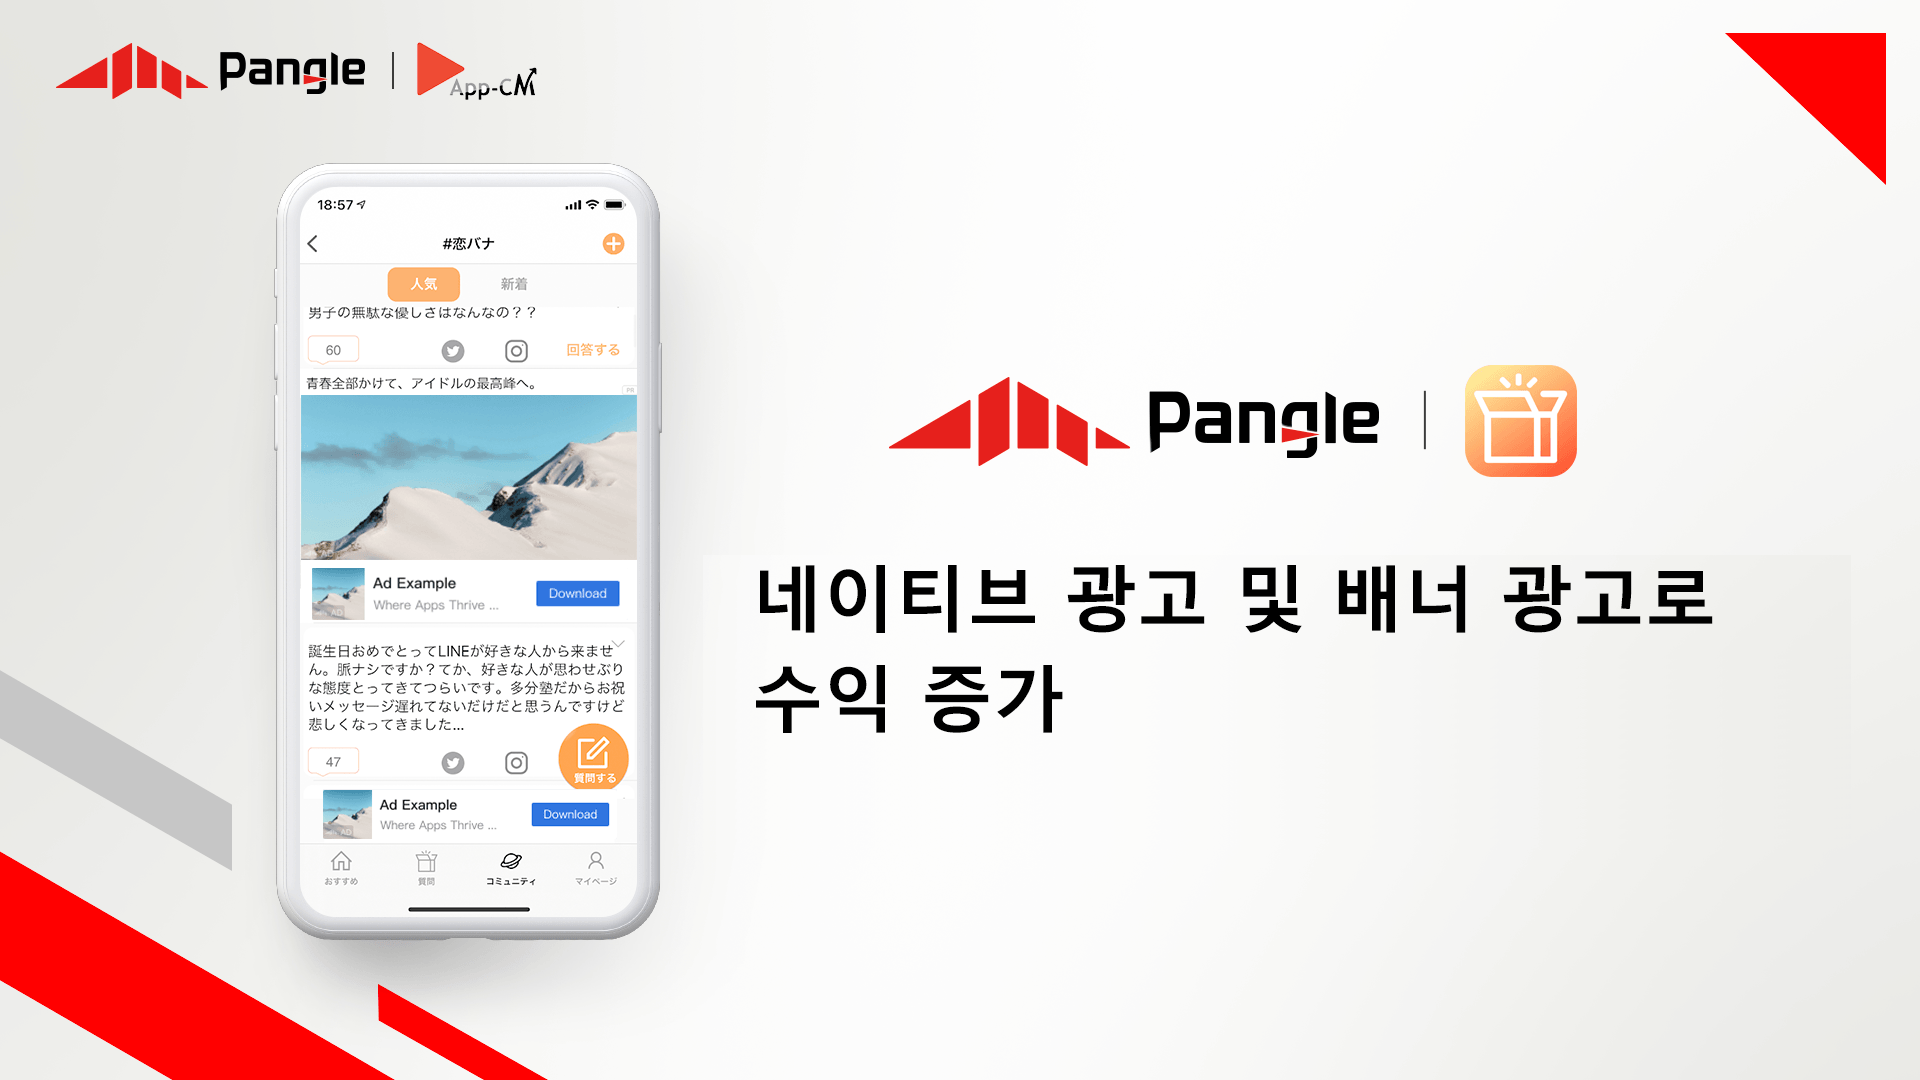 App-CM, 팽글과 세계를 재창조하고 수익을 개선하다 - BoxFresh